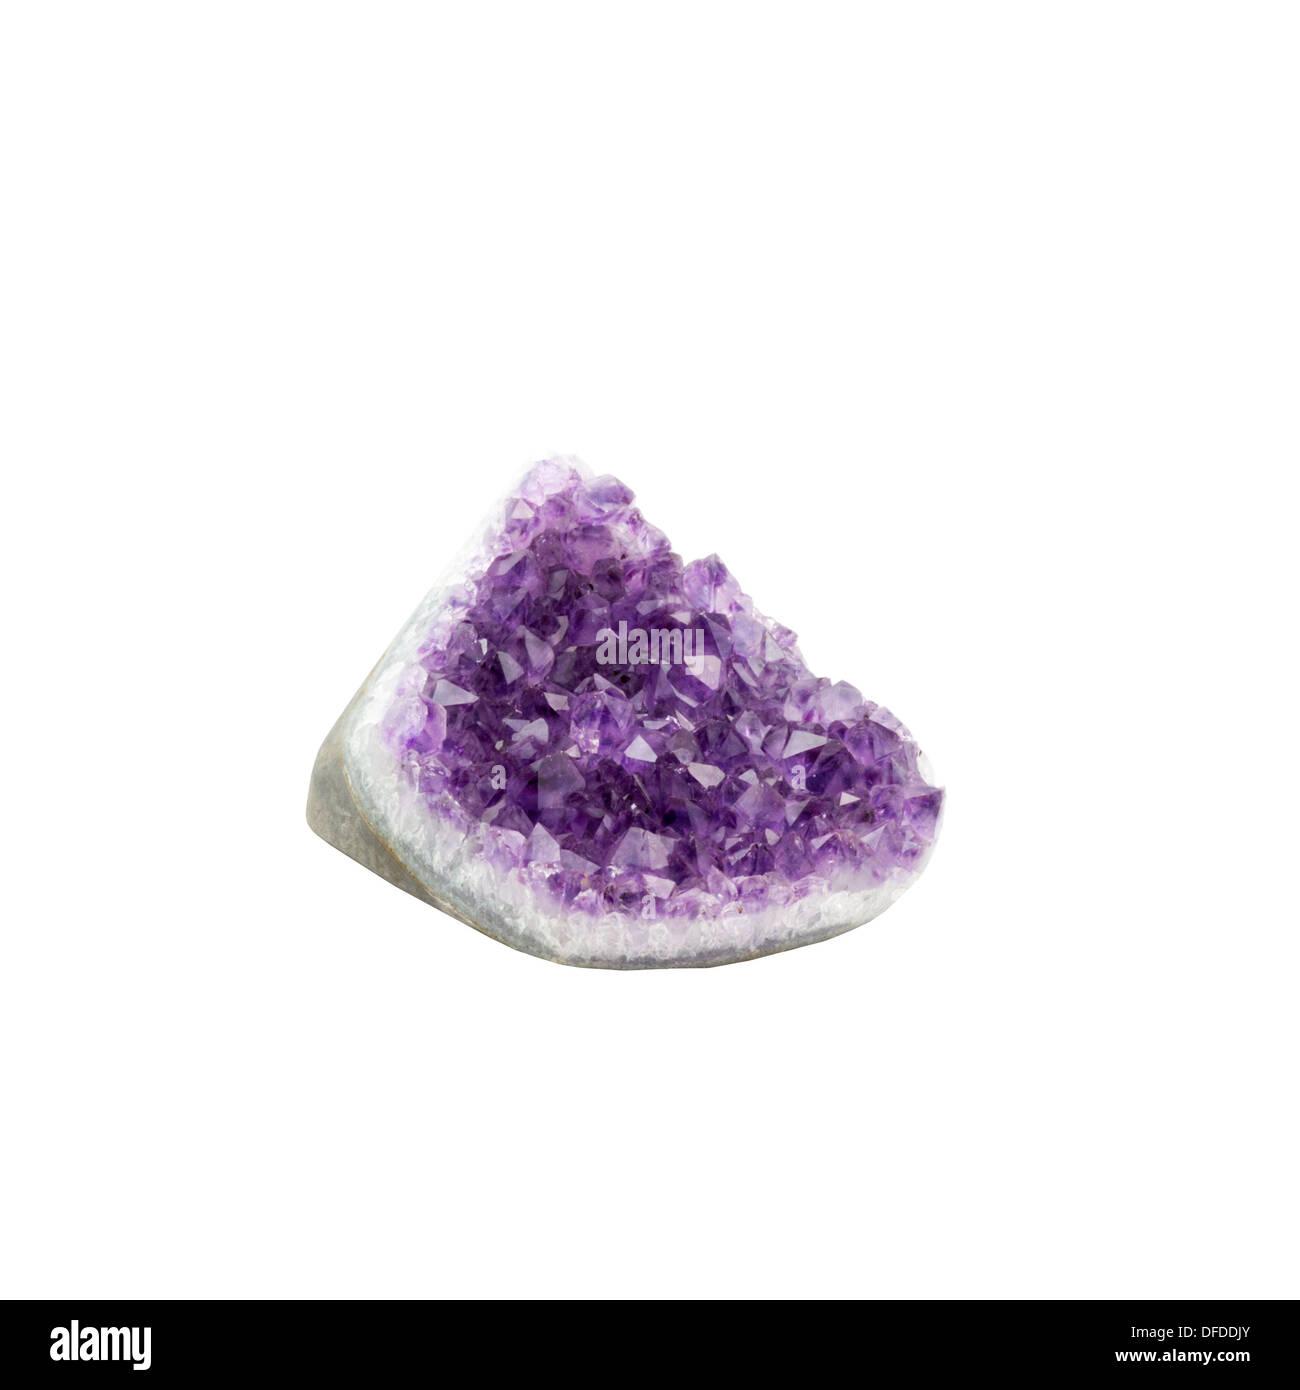 amethyst quartz crystal - Stock Image